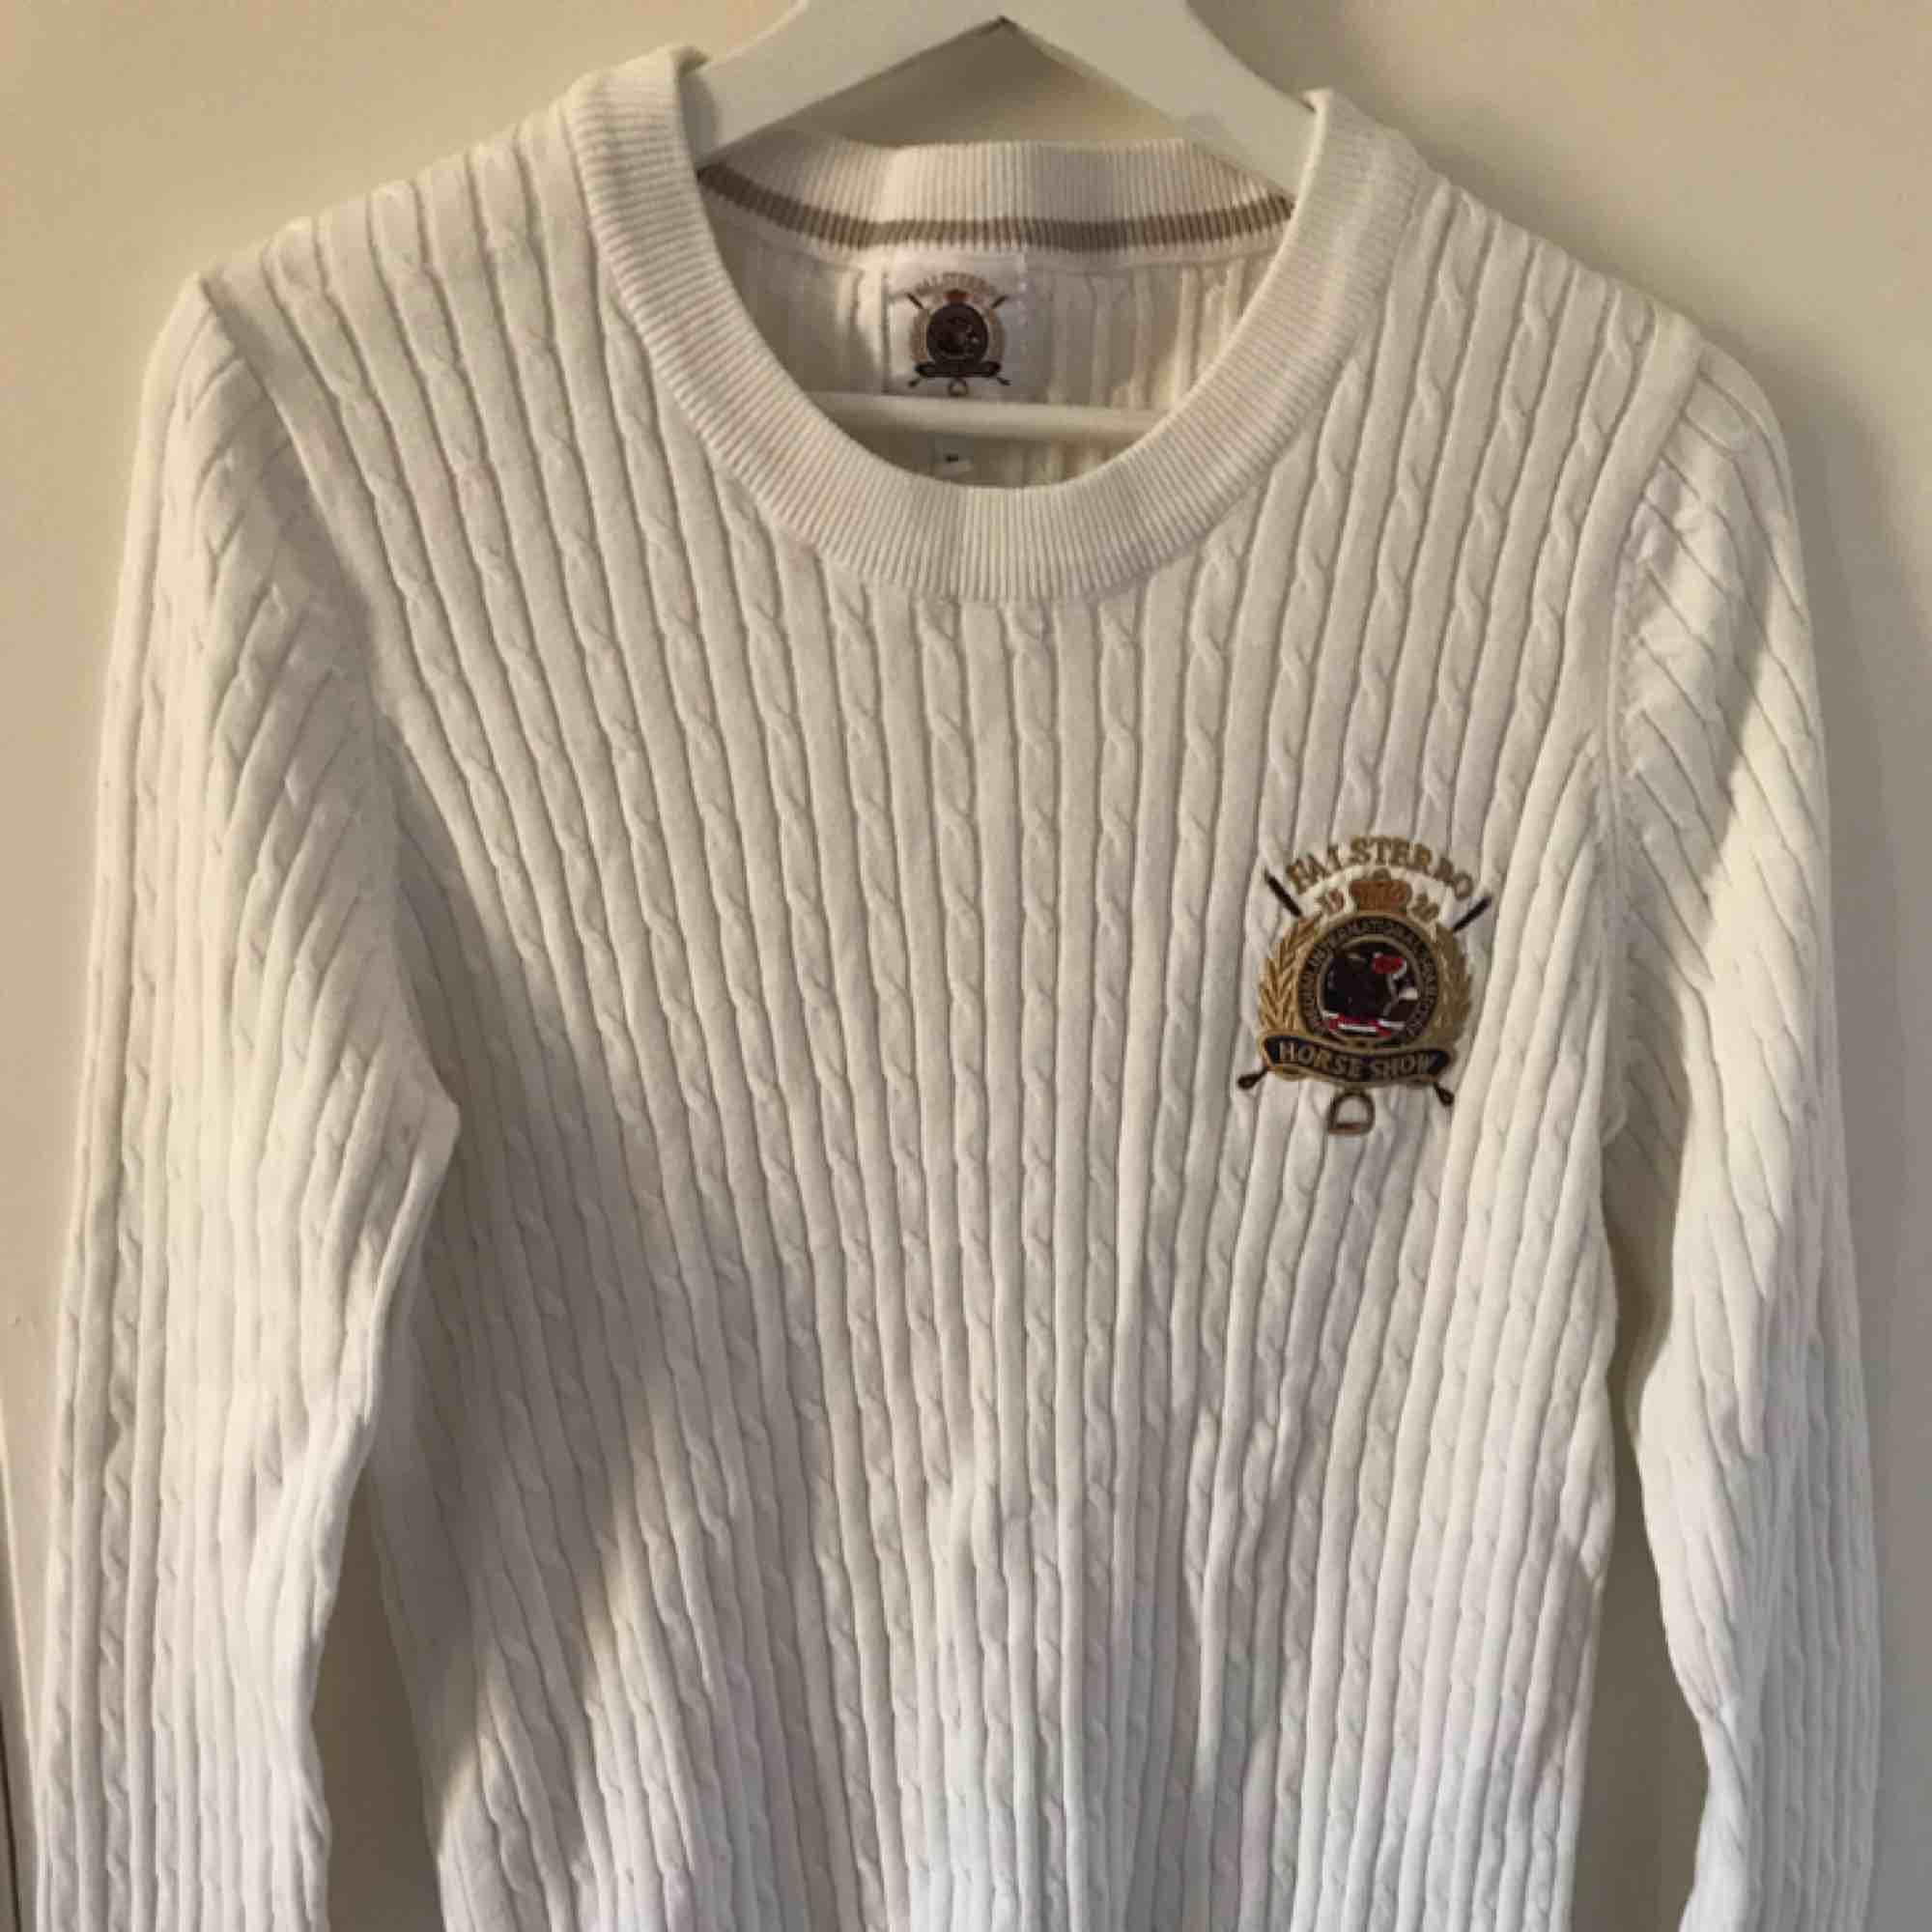 Vit kabelstickad tröja med tryck Står XL, men extremt liten i storlek, mer som M eller L Aldrig använd. Tröjor & Koftor.